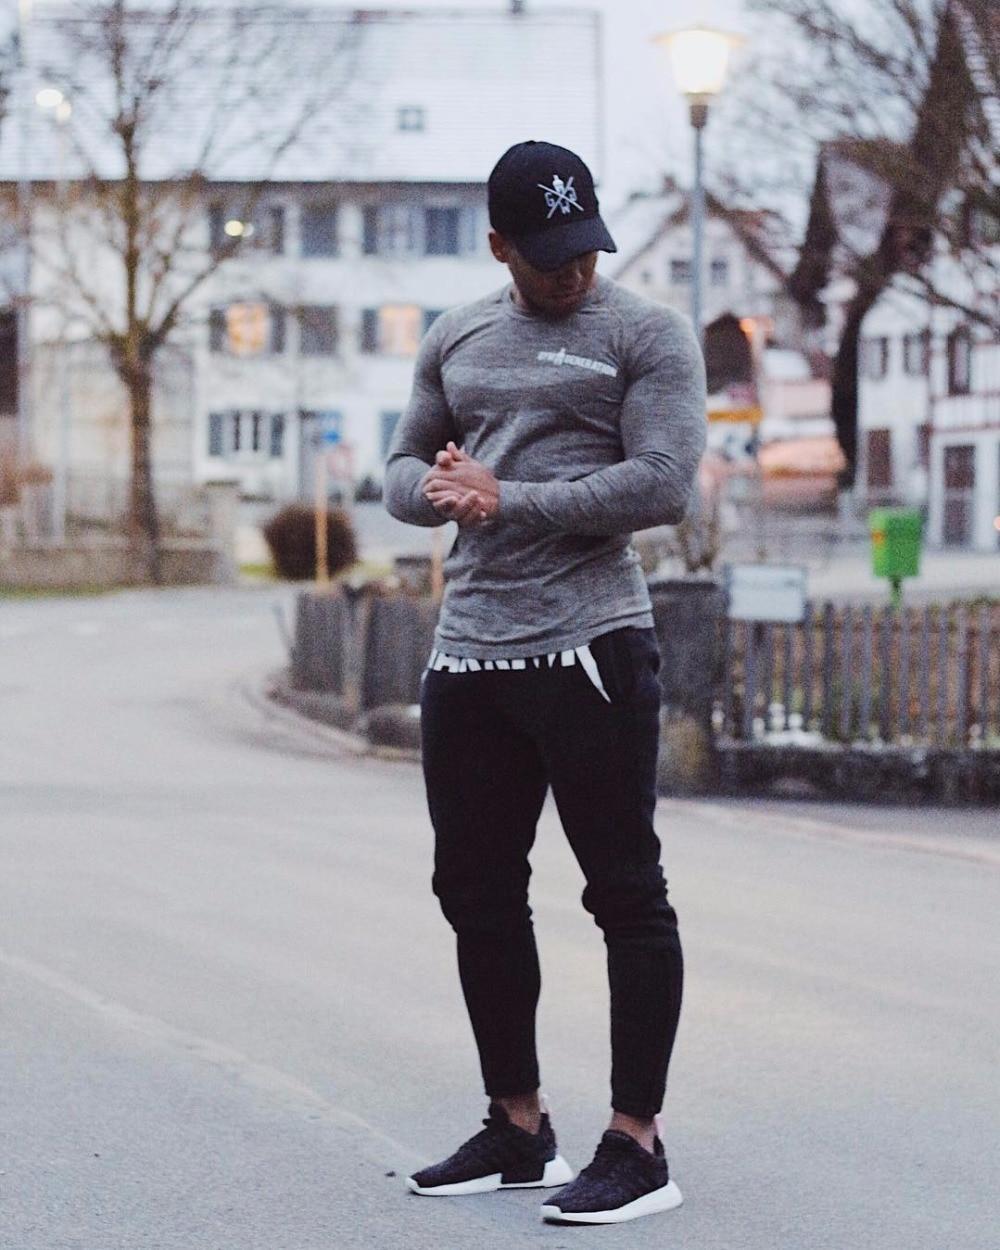 Brand Gyms Men Joggers Casual Men Sweatpants Joggers Pantalon Homme Trousers Sporting Clothing Bodybuilding Pants 24